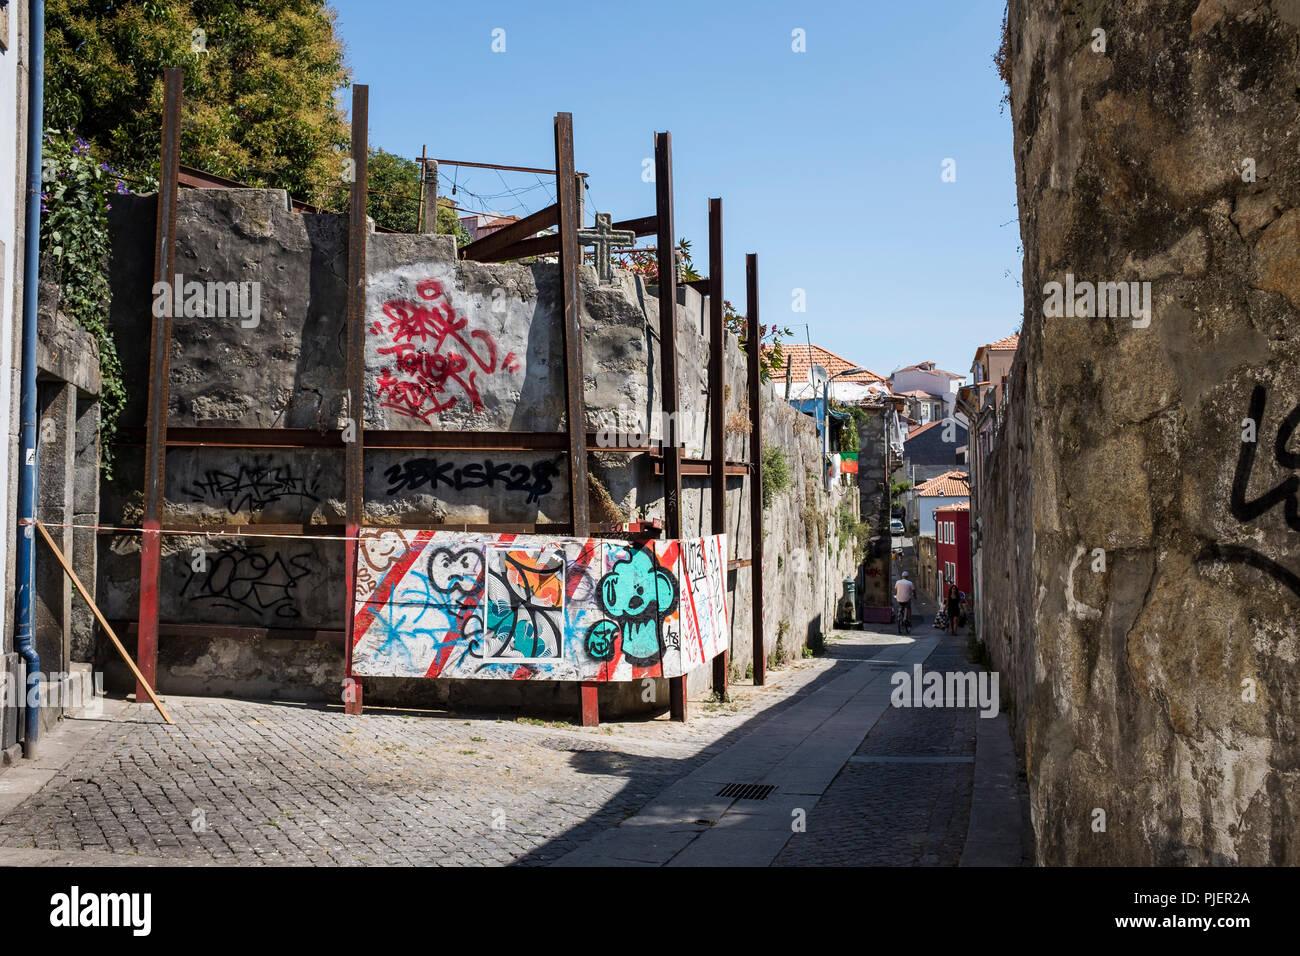 Srreet art, Porto, Portugal. Stock Photo